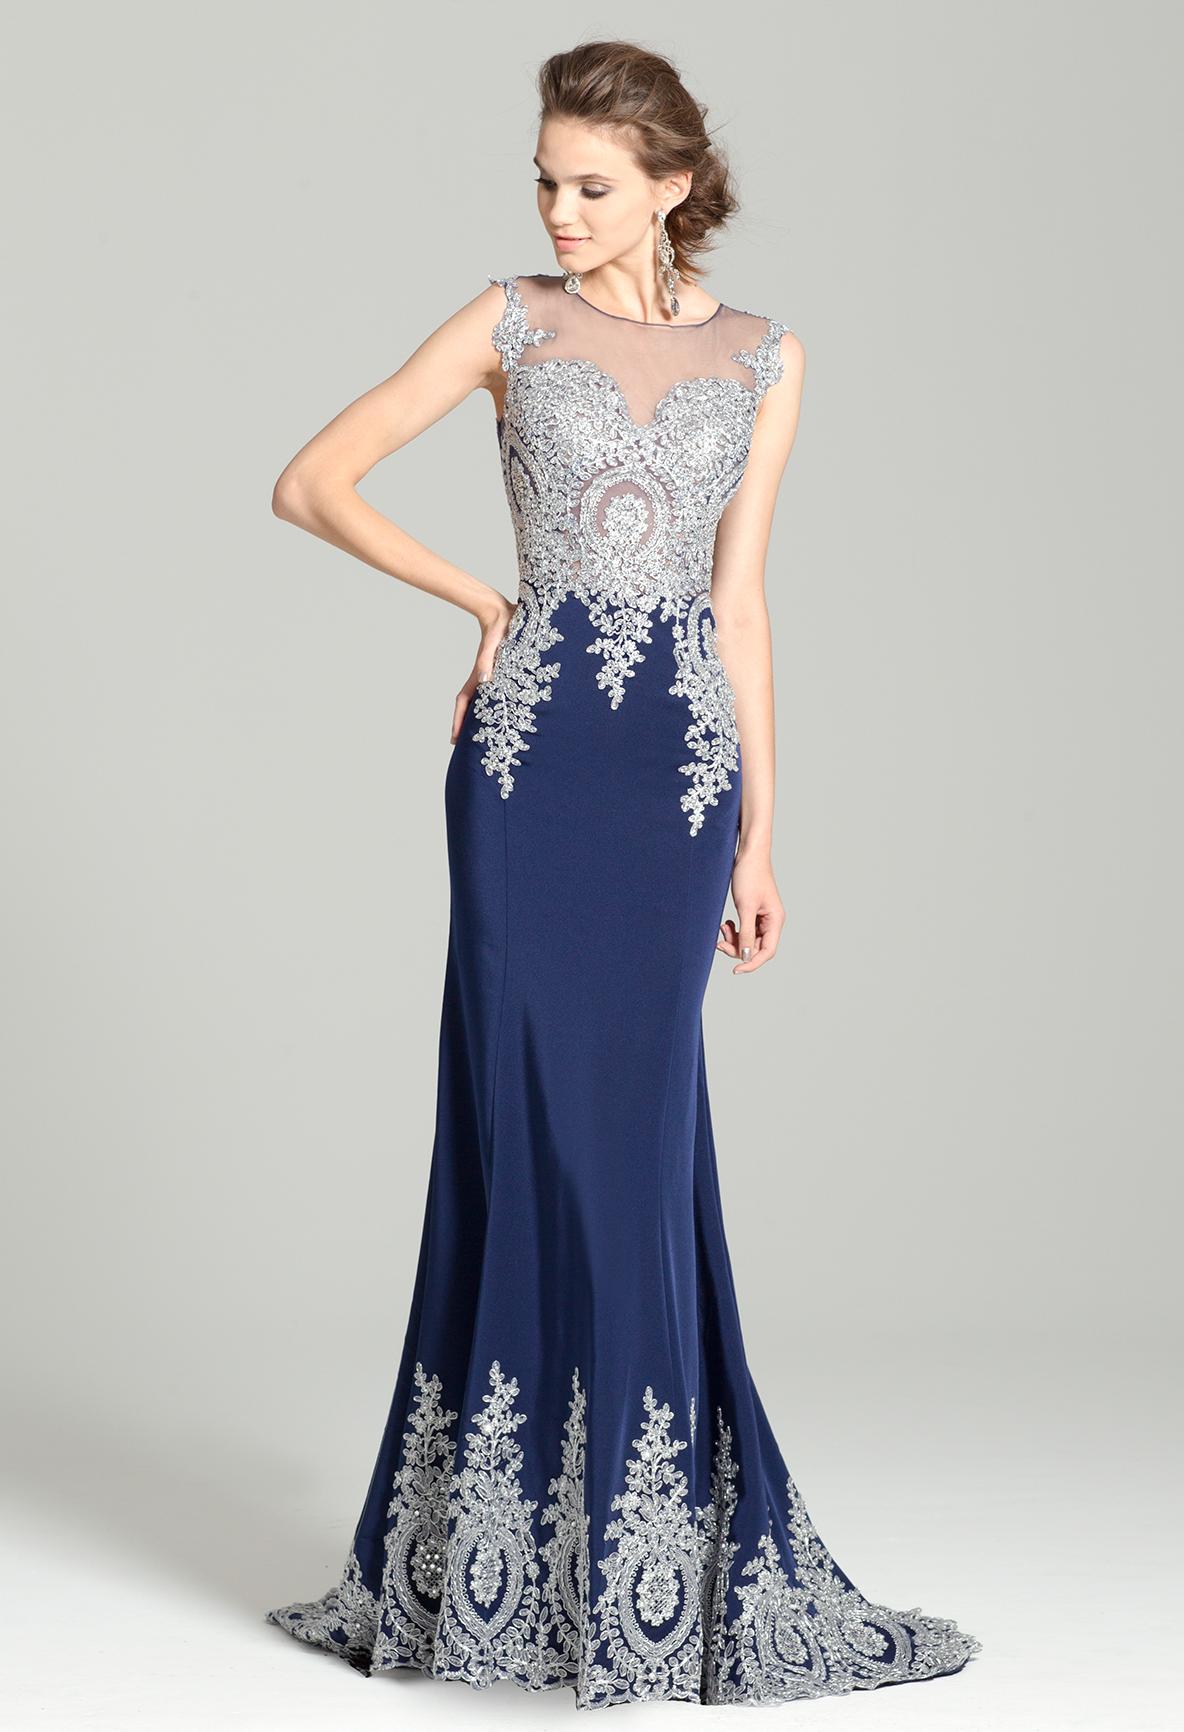 Applique Mesh Dress From Camille La Vie And Group Usa Vestidos Moda Festa Moda [ 1732 x 1184 Pixel ]